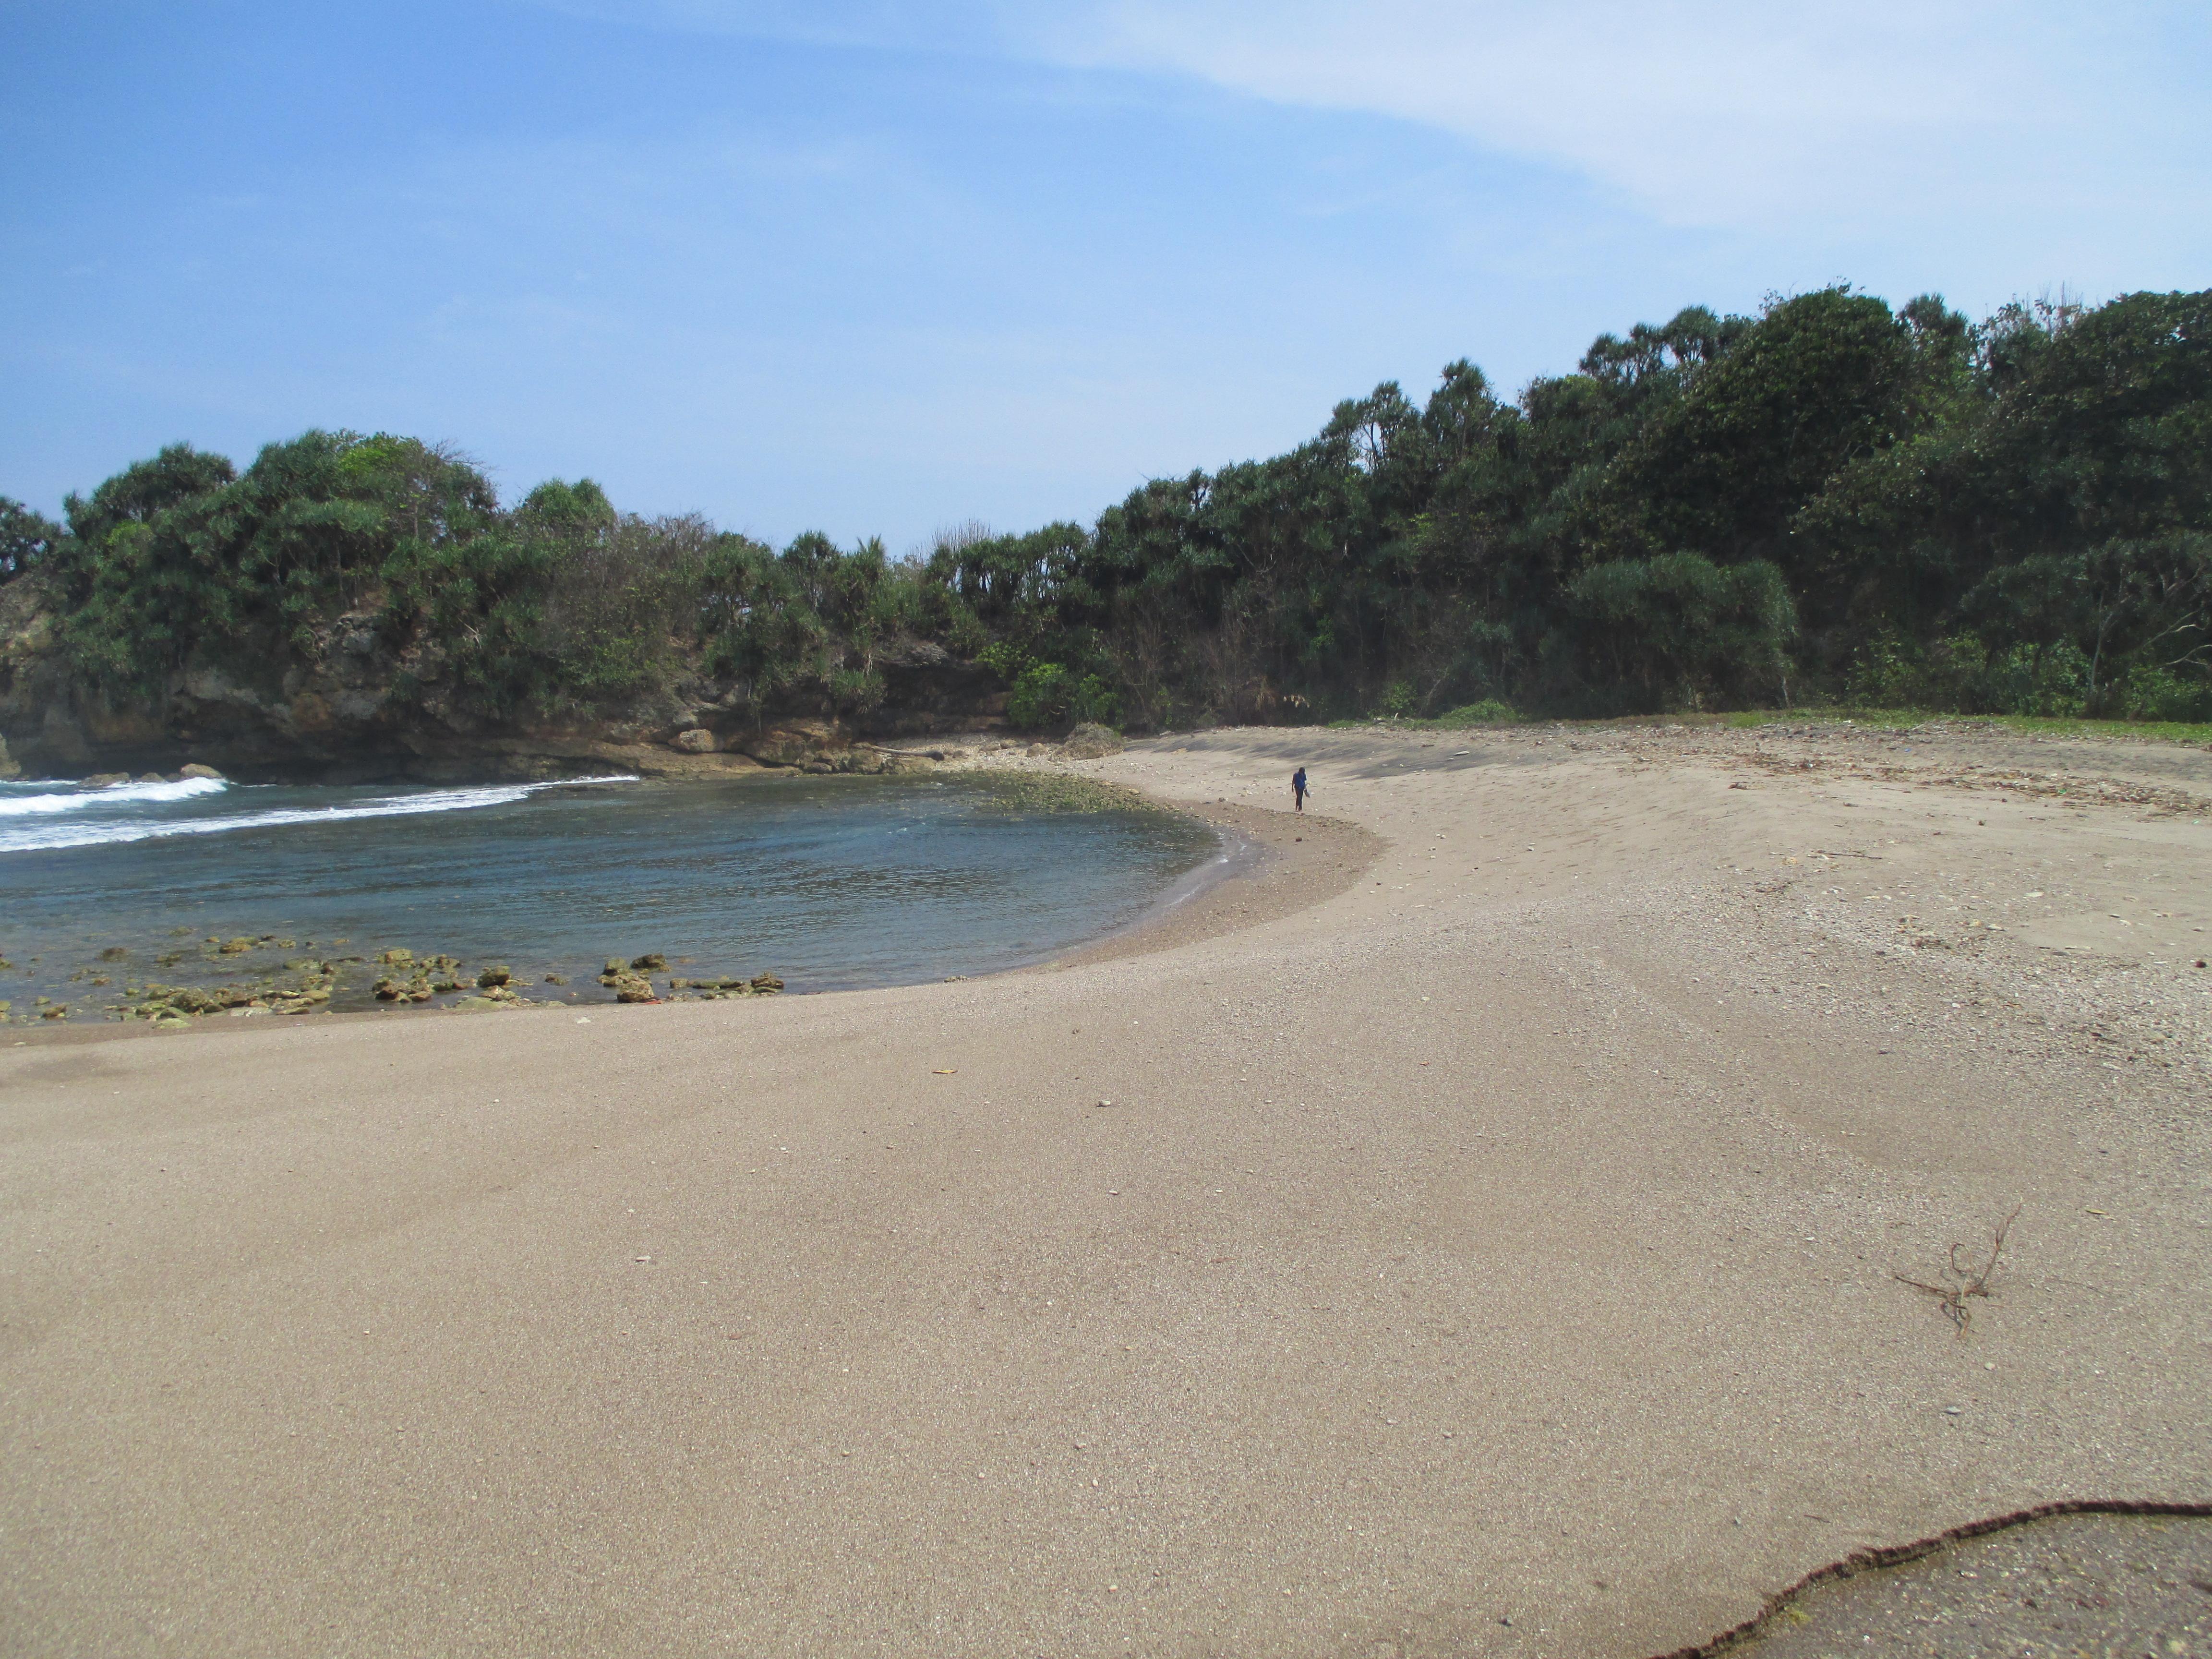 Pantai Jonggring Saloka Kim Smkm 6 Kota Malang Terletak Desa